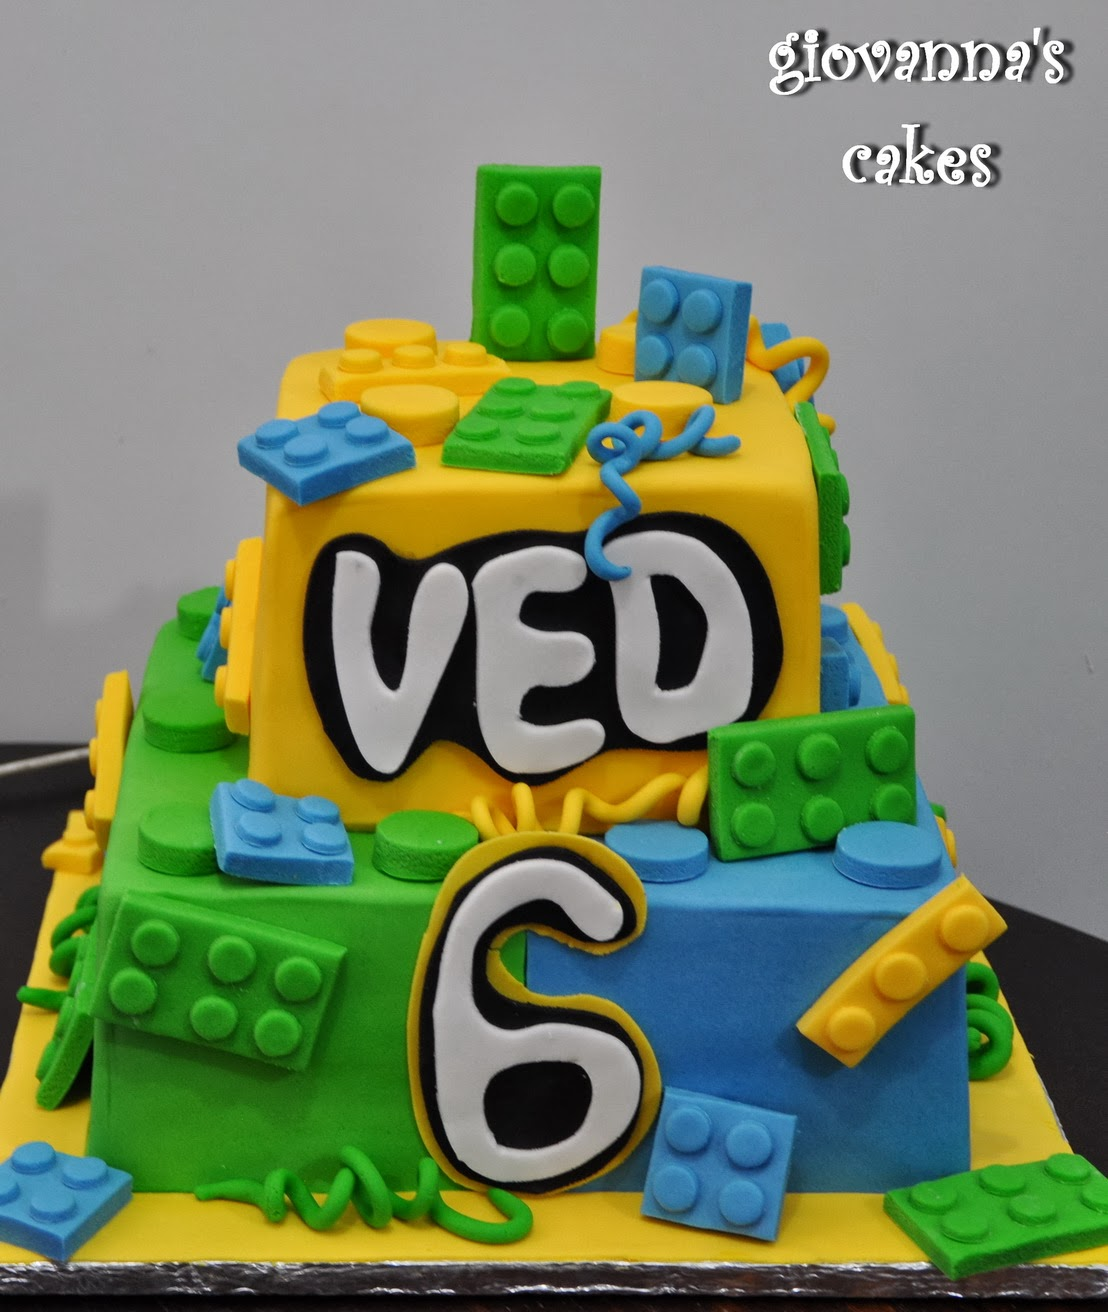 Giovannas Cakes Veds Lego Themed Birthday Cake